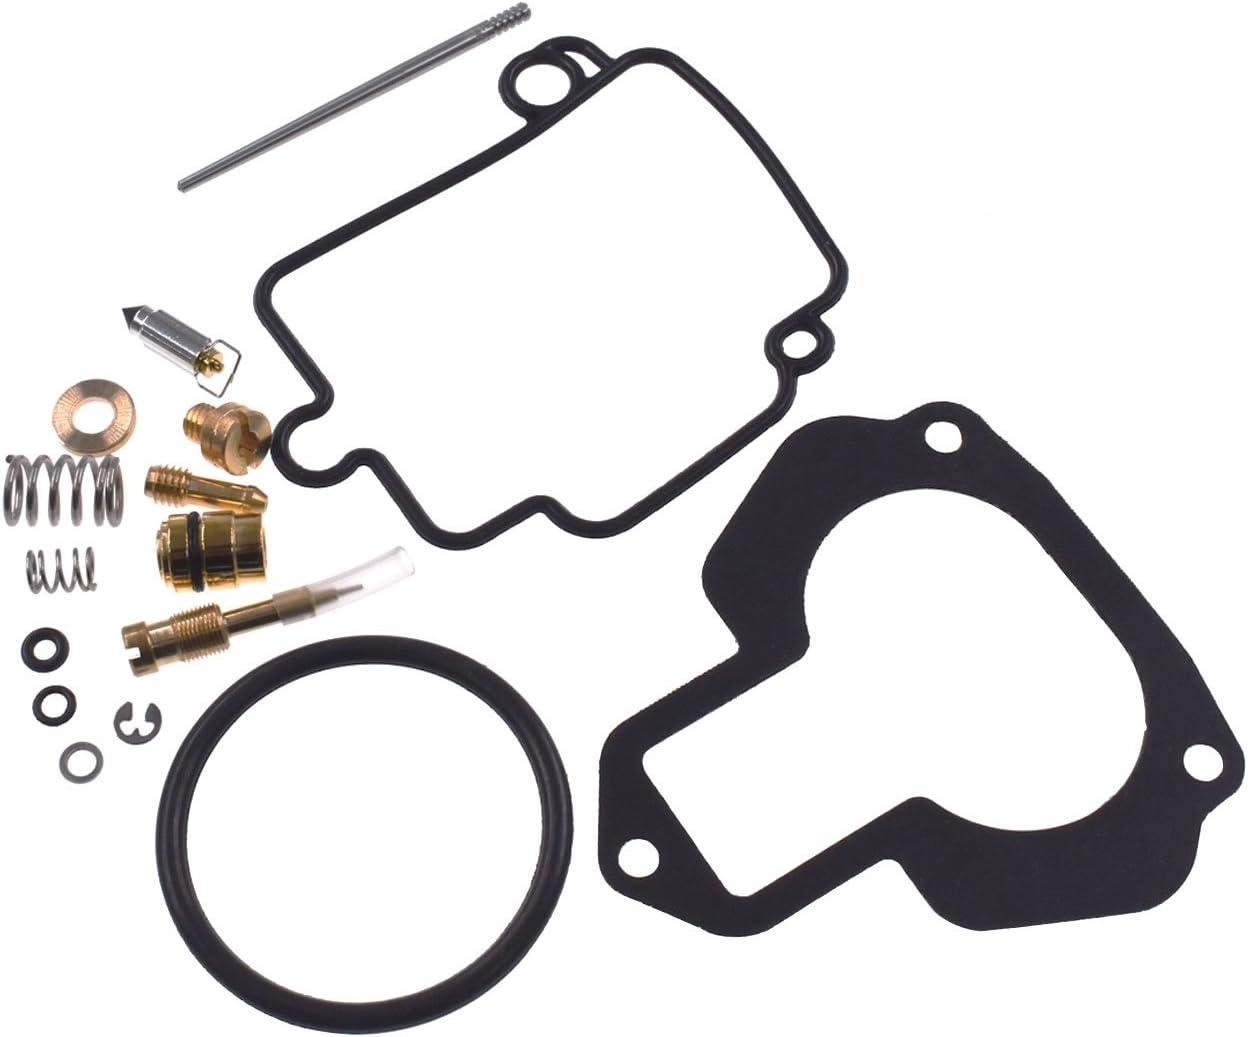 Ruichang Kit de r/éparation pour carburateur Yamaha Big Bear 350 YFM350FW 89-97